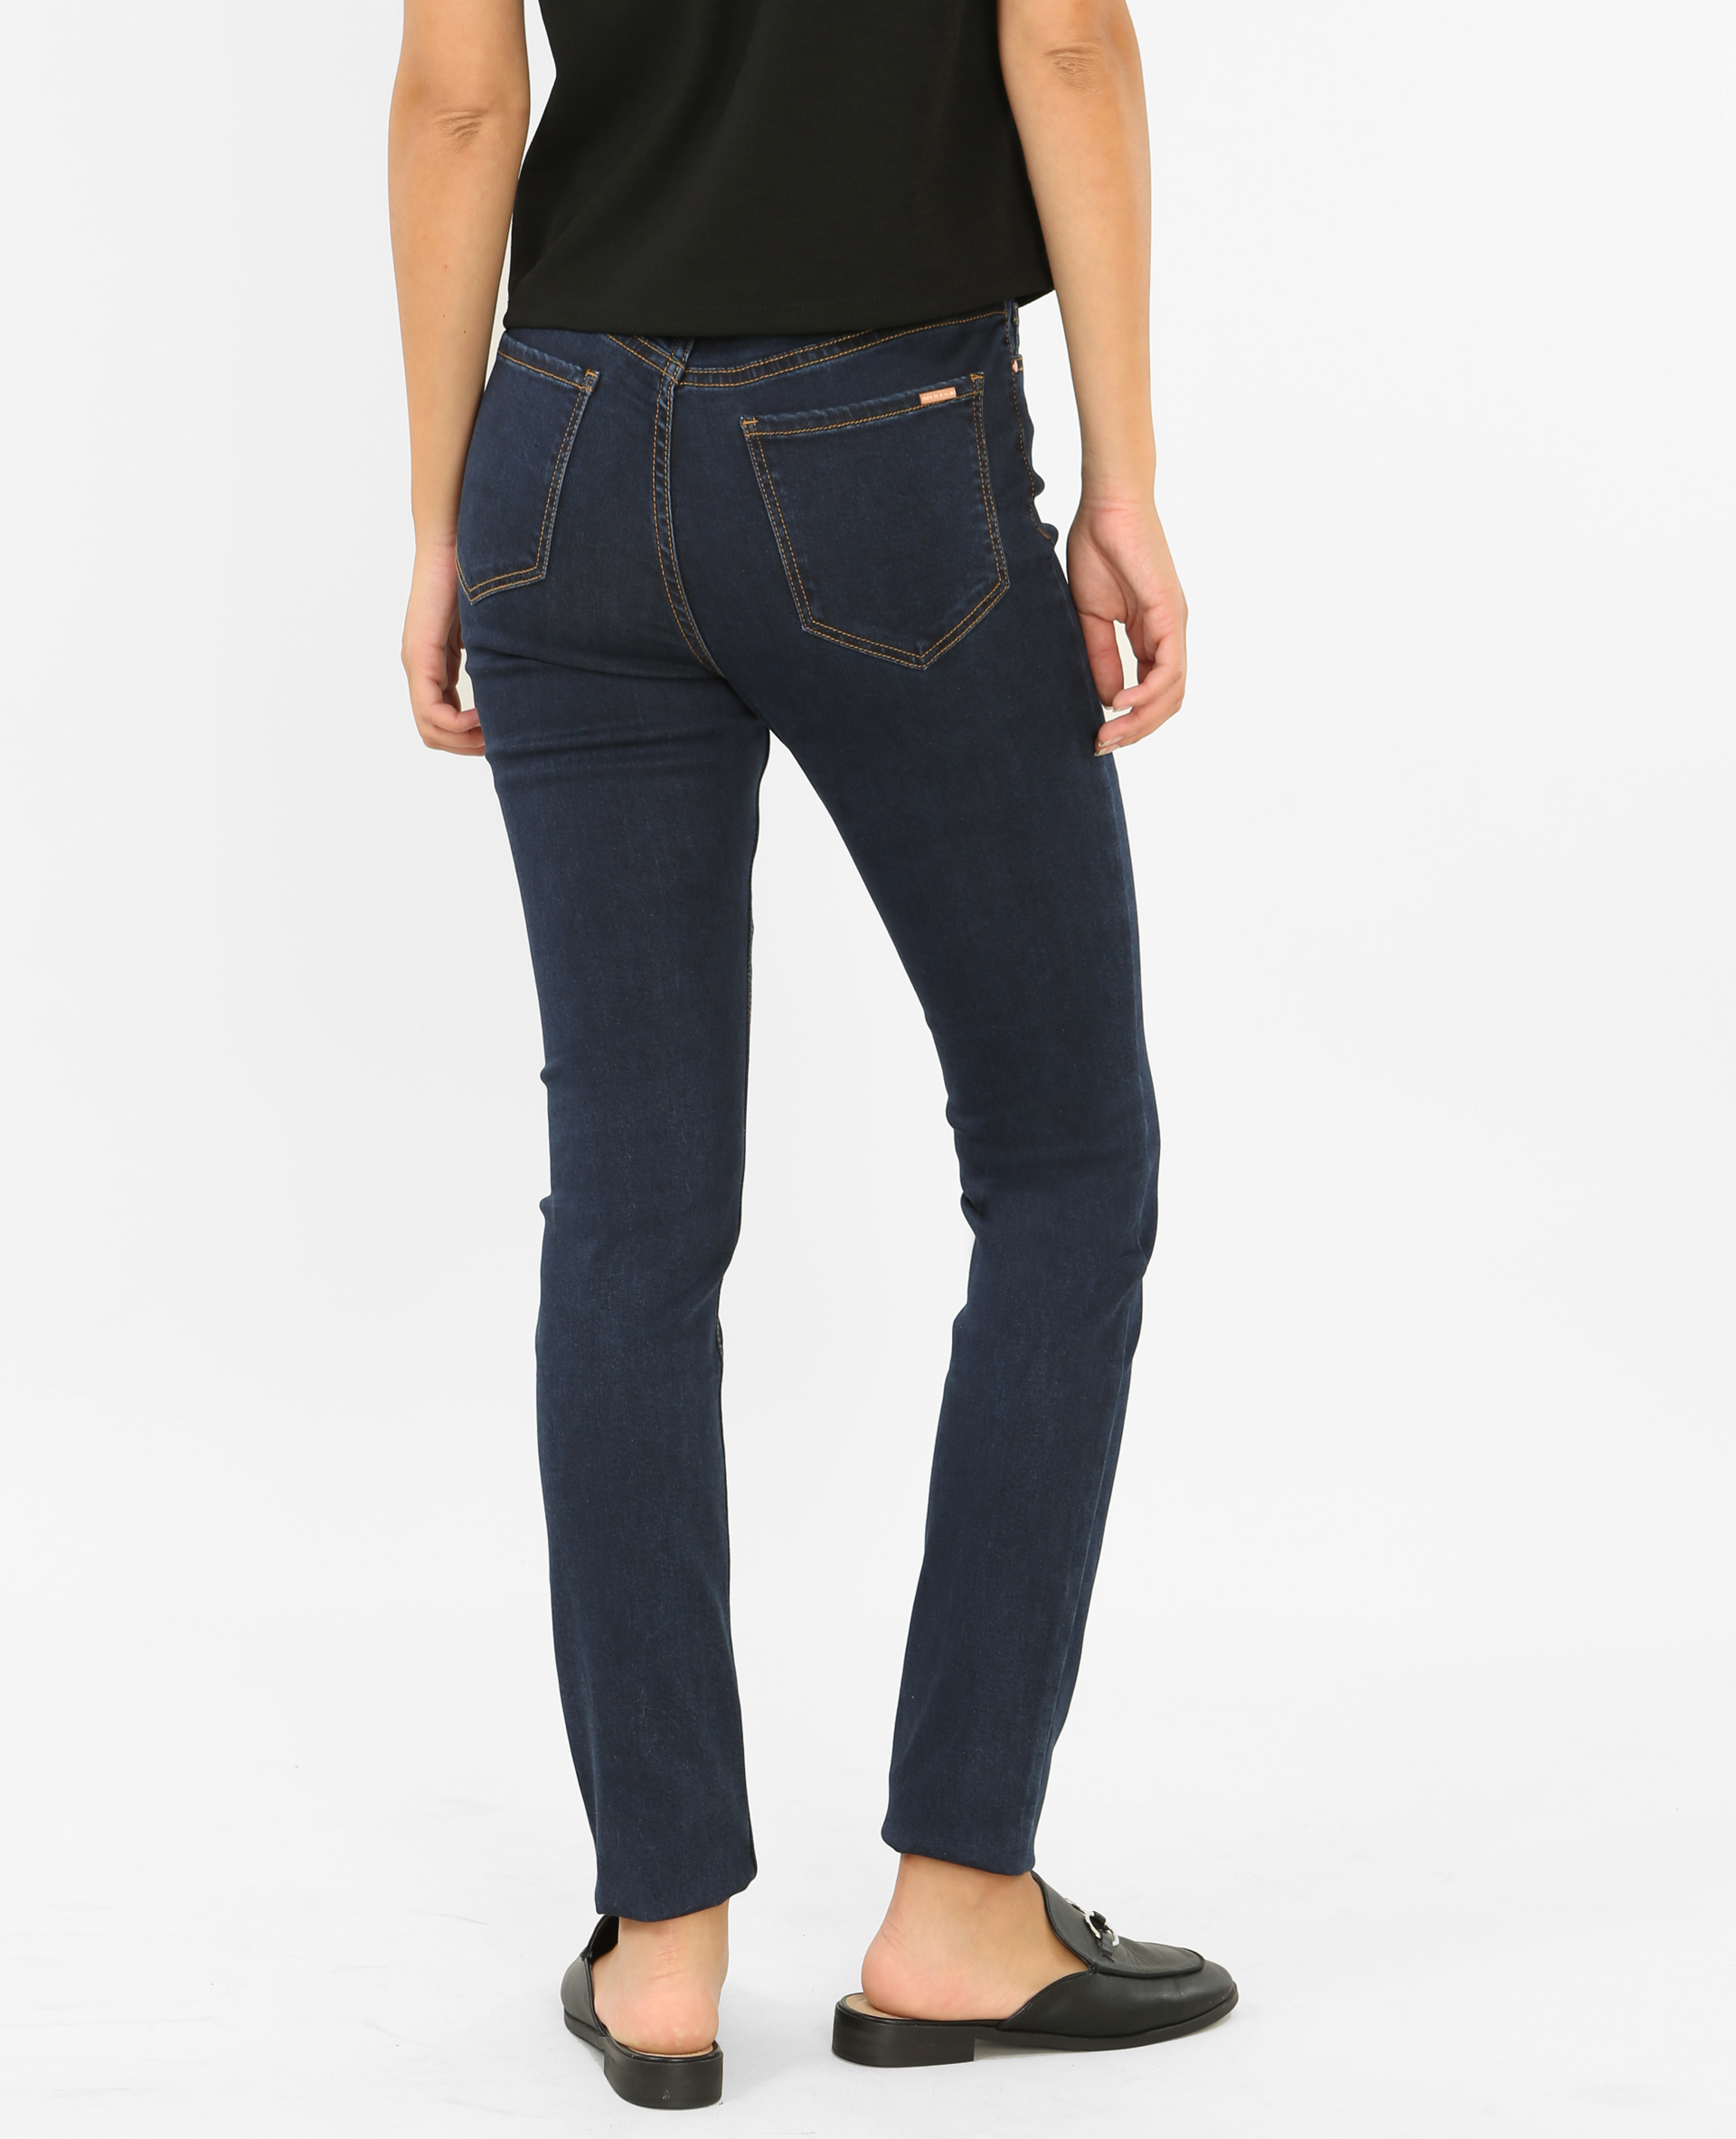 NUOVO Ragazza lemmi Jeans Skinny Fit NOS TUBO slim Blu scuro Stretto Taglia 152